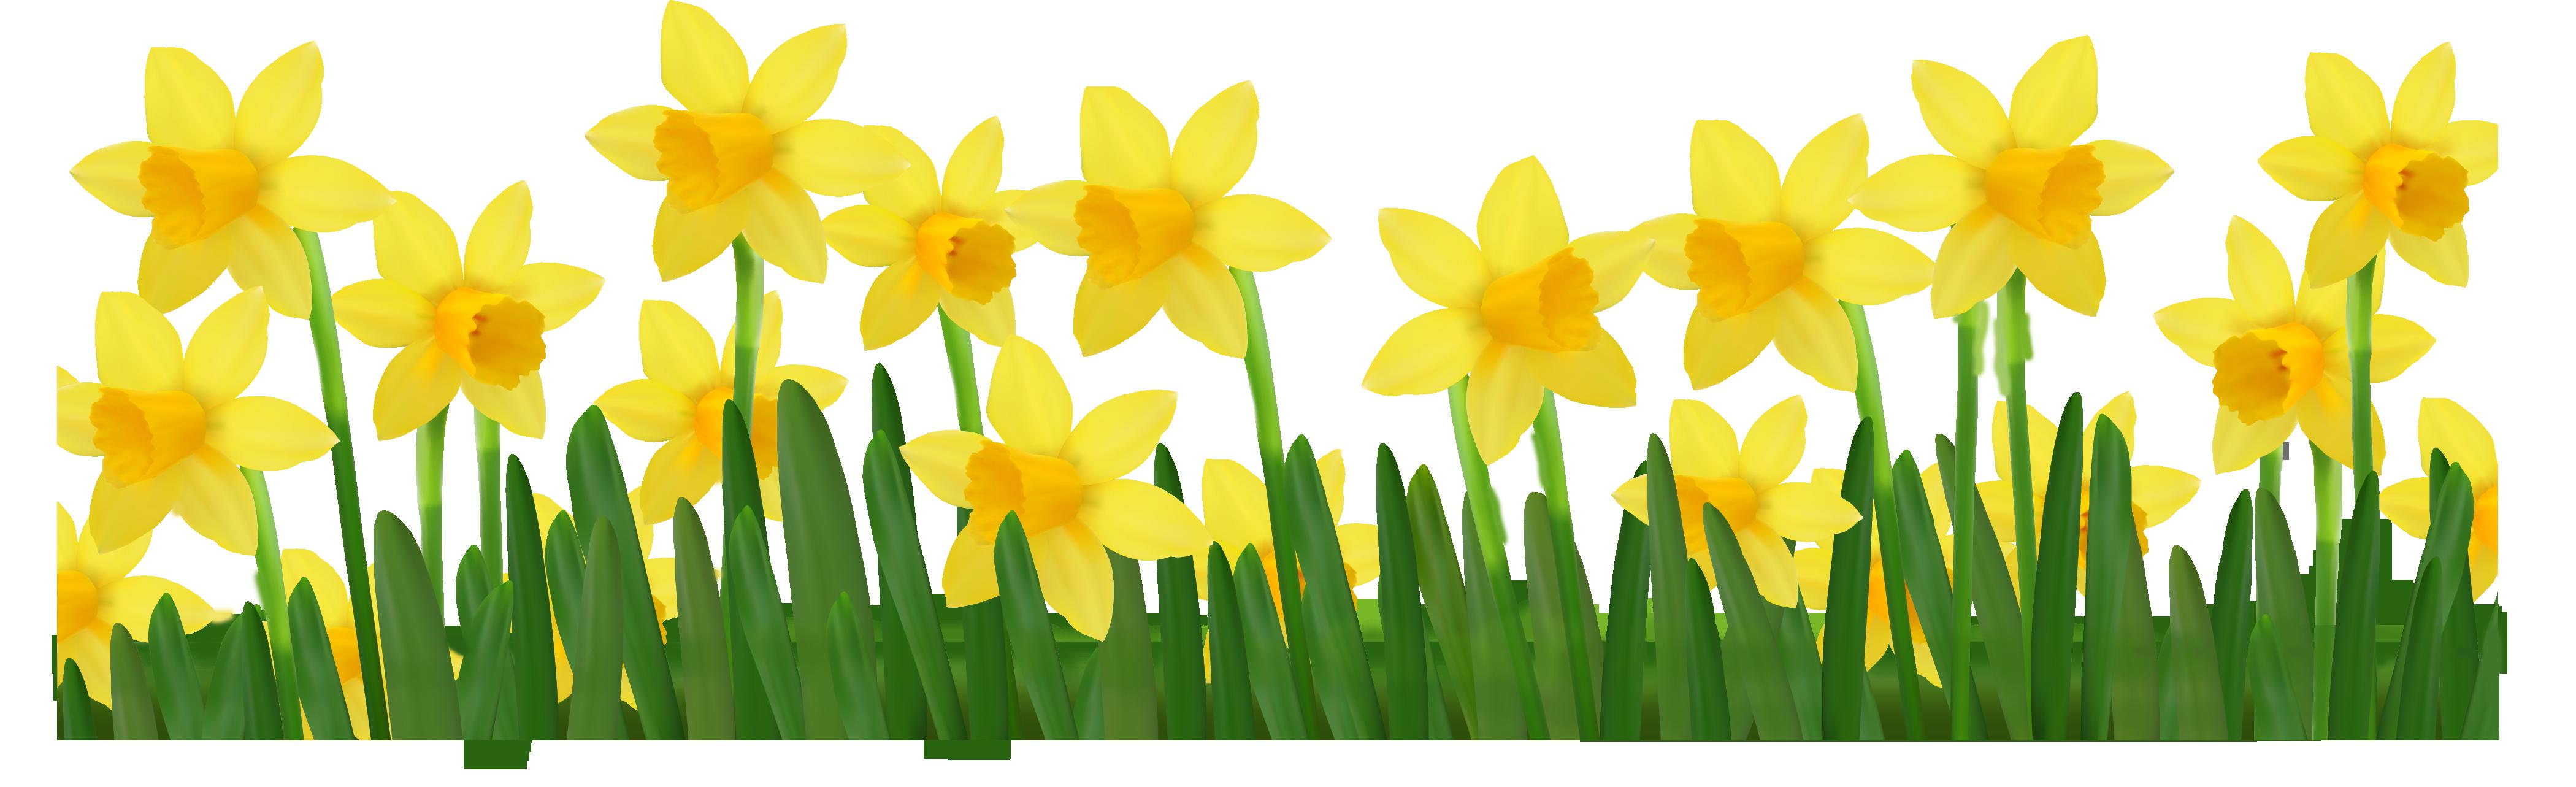 Background clipart daffodil Art Clip Clipart Art Clip